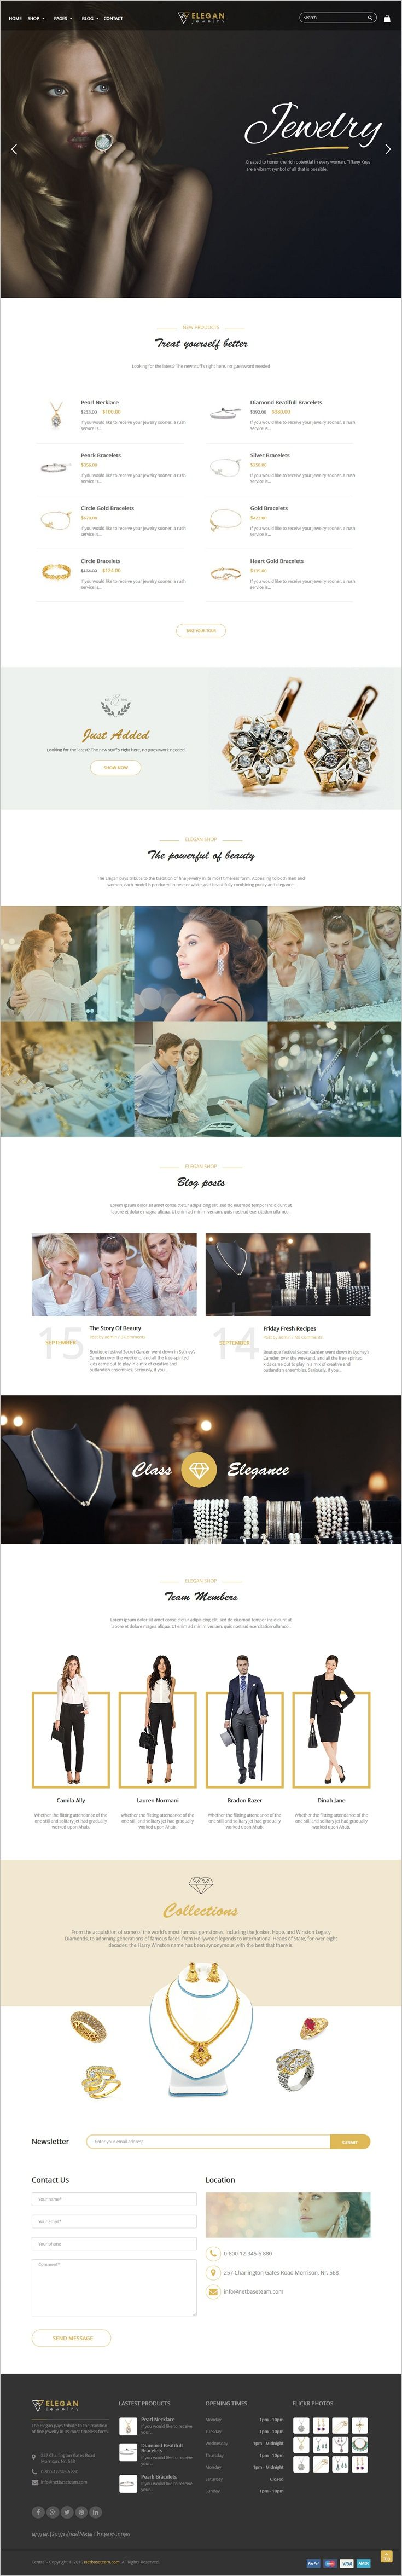 Jewelry is an stunning responsive #WordPress theme for #Jewelry #diamond #goldsmith shop eCommerce website download now➩ https://themeforest.net/item/premium-jewelry-wordpress-theme/18042440?ref=Datasata